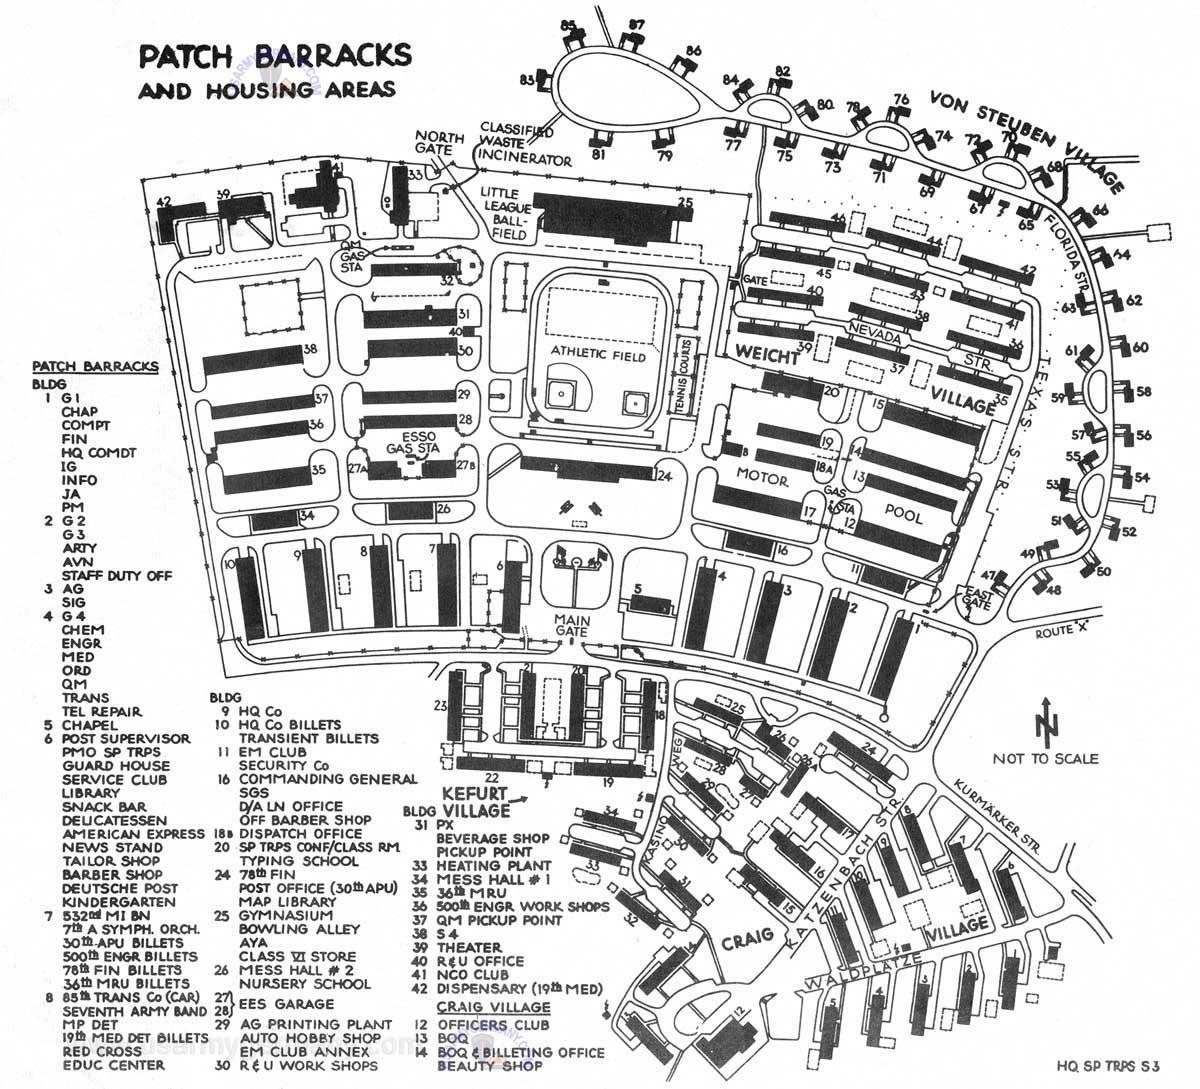 Vaihingen Patch Barracks